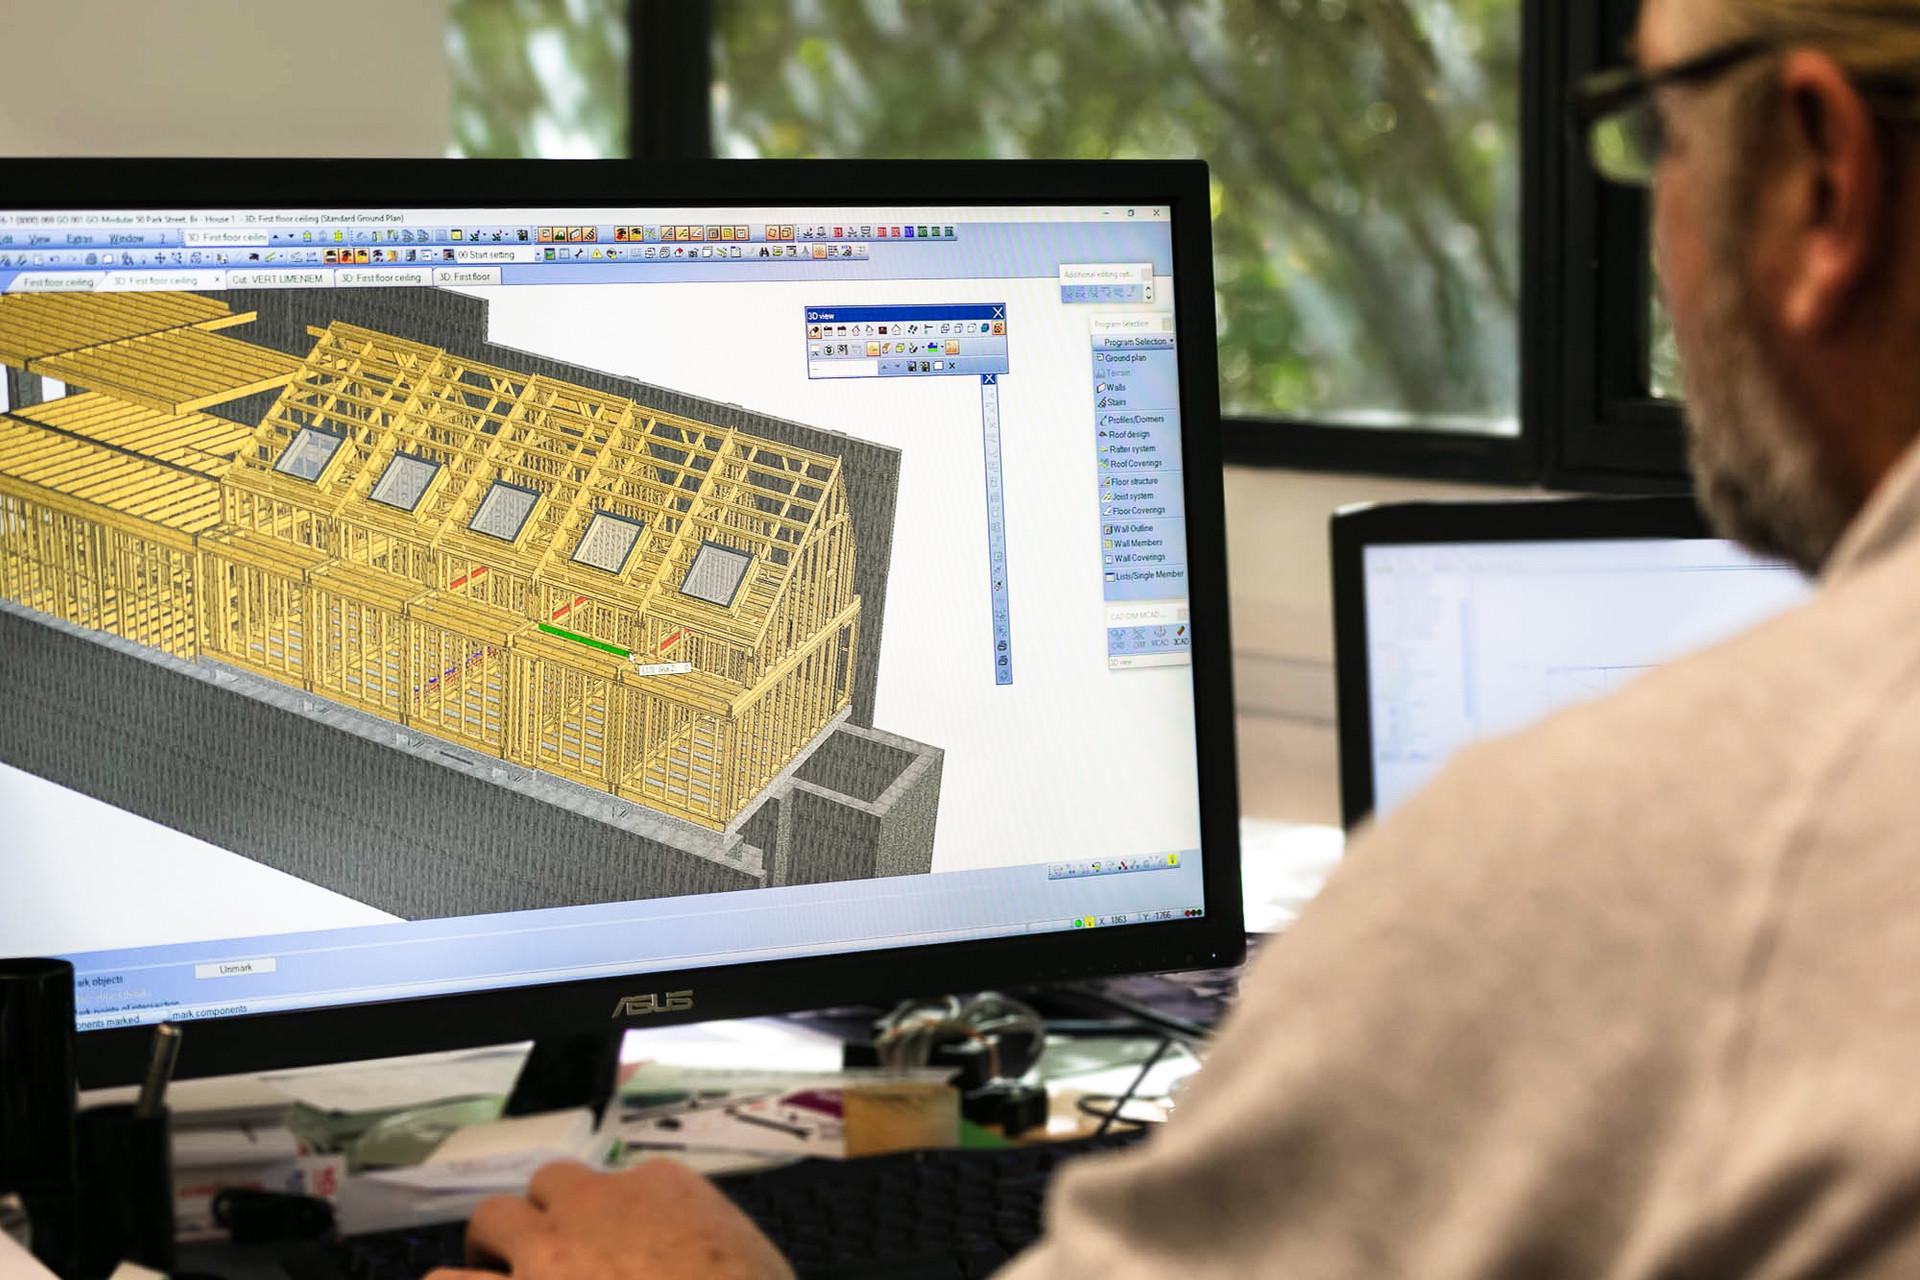 "<img src=""modular drawing.jpg"" alt=""modular construction drawing on the screen""/>"